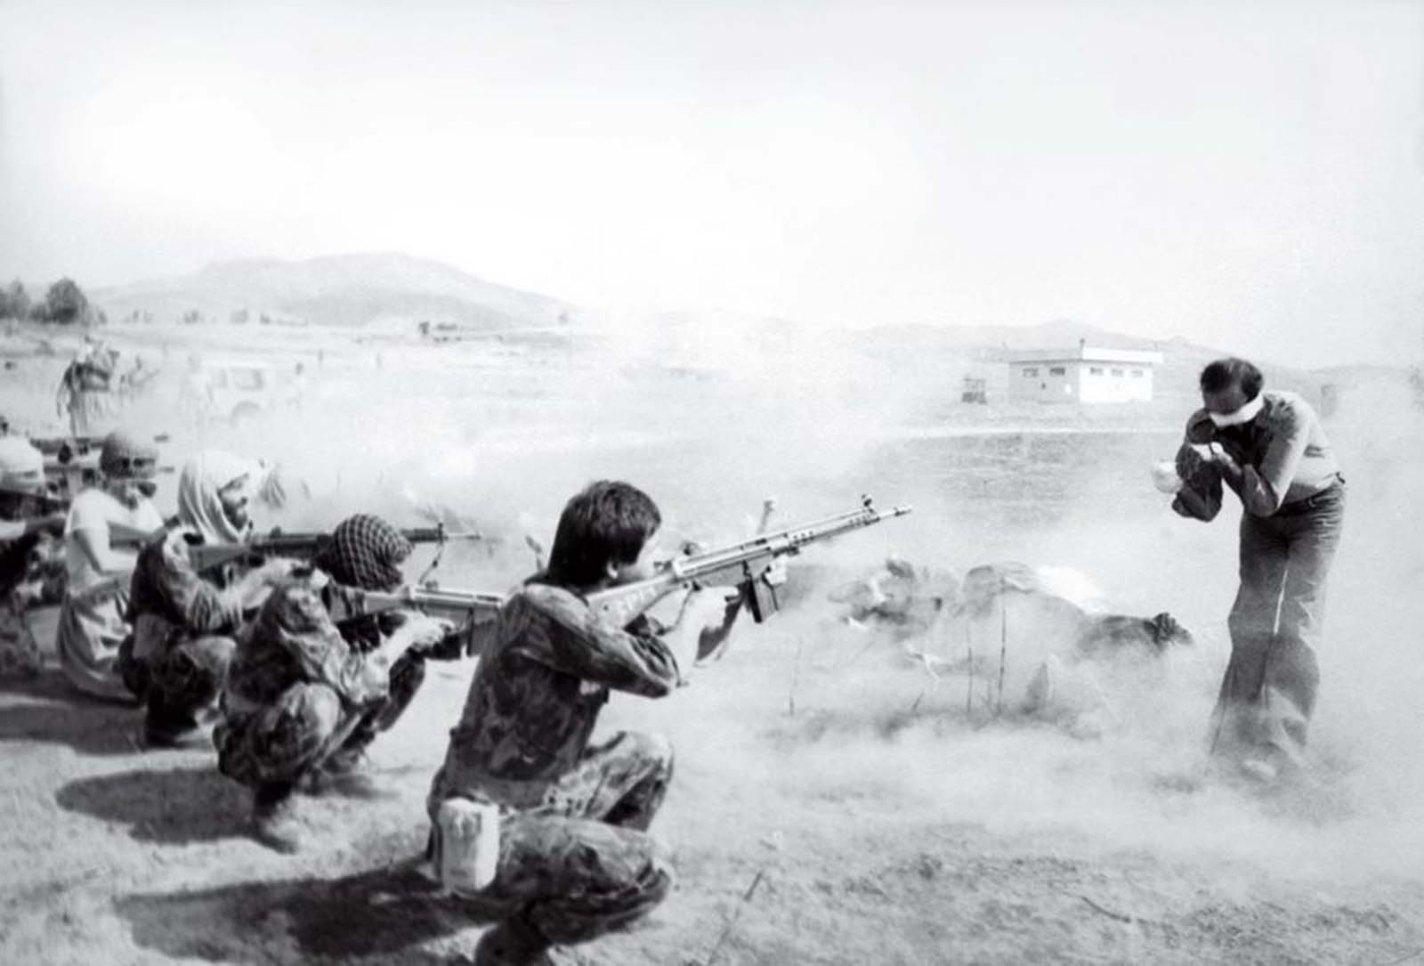 Firing Squad in Iran, Jahangir Razmi, 1979